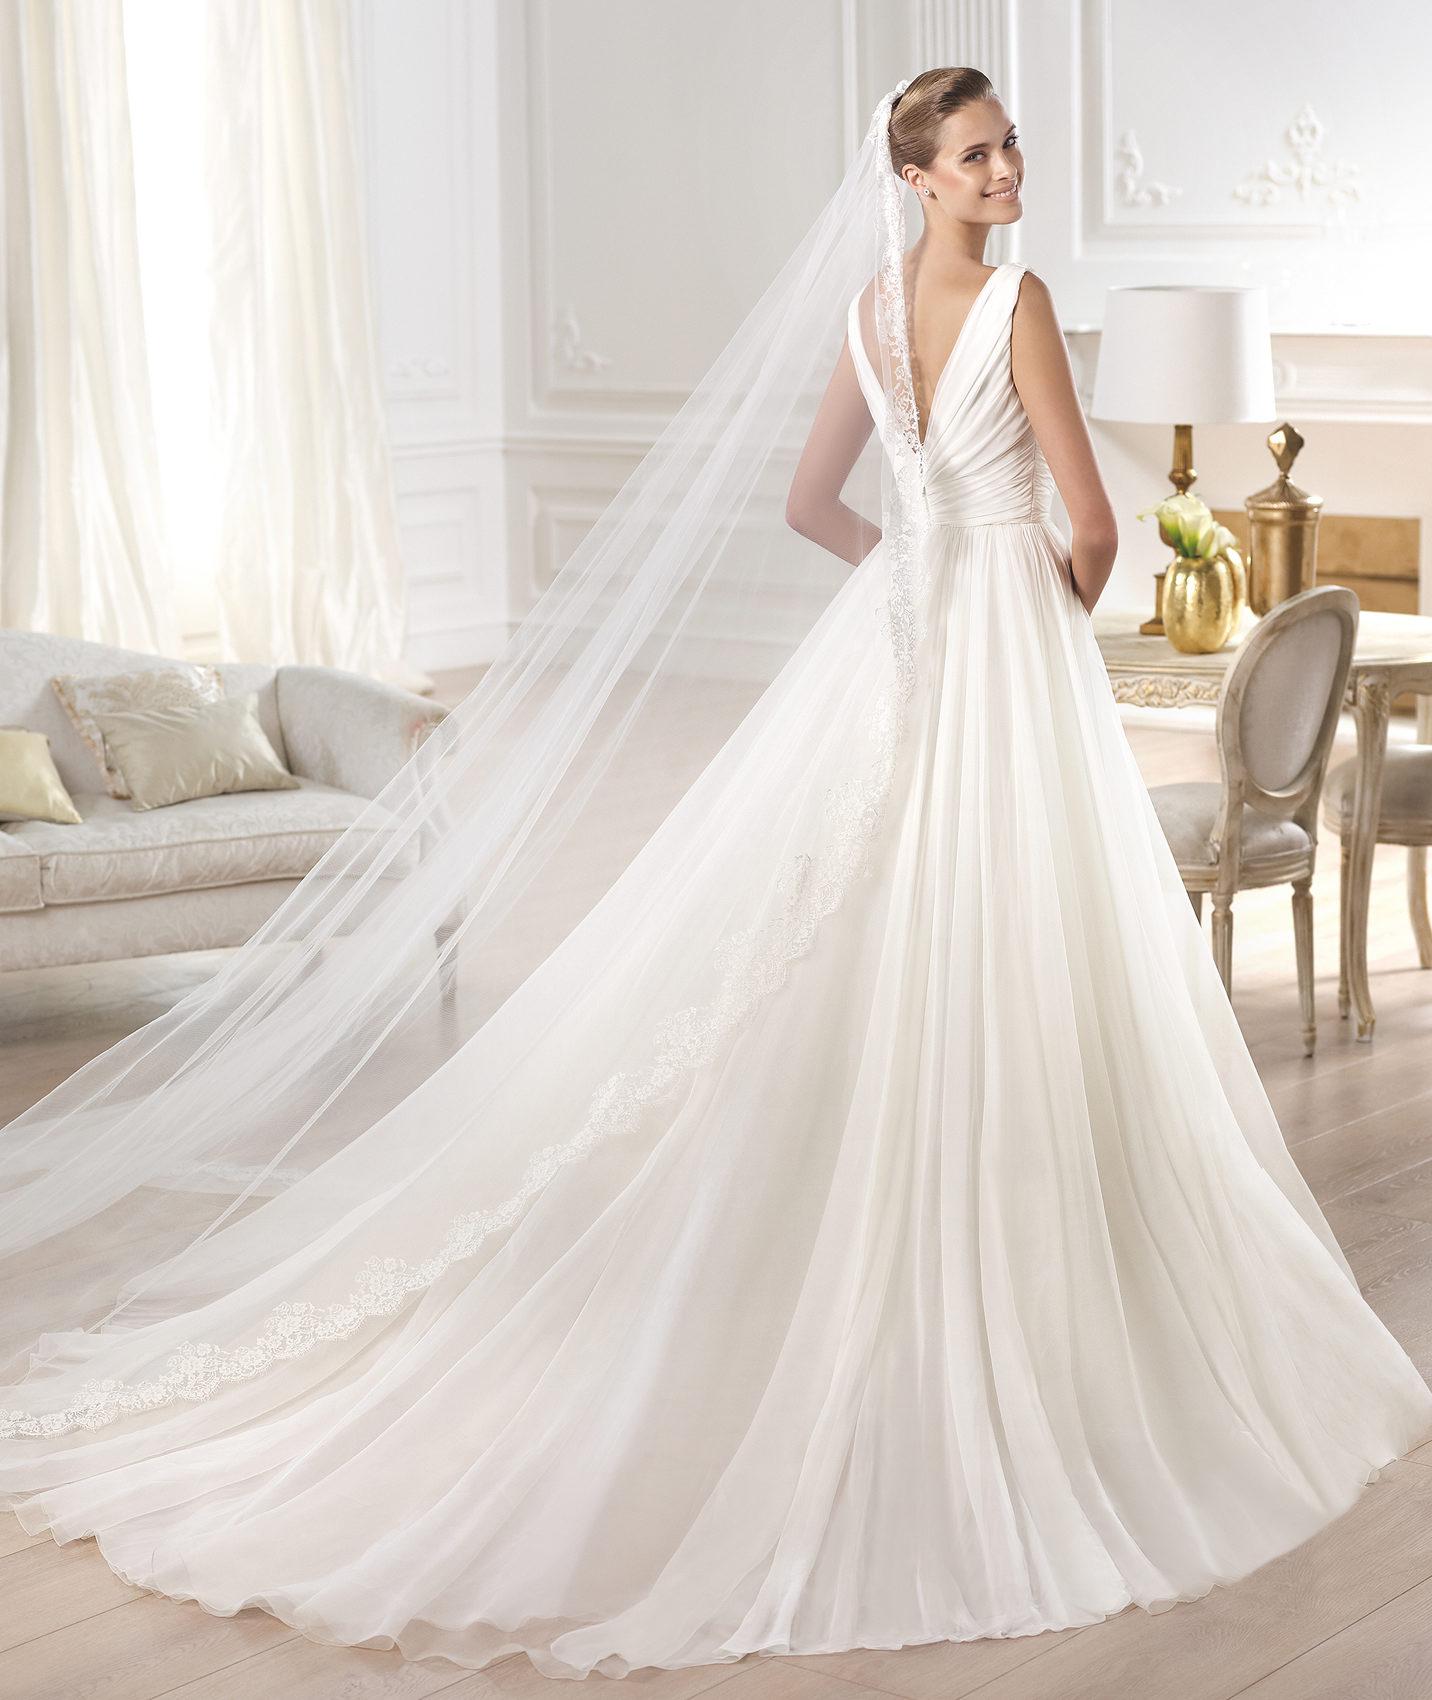 Wedding Gowns Stores: Precious Memories Bridal Shop